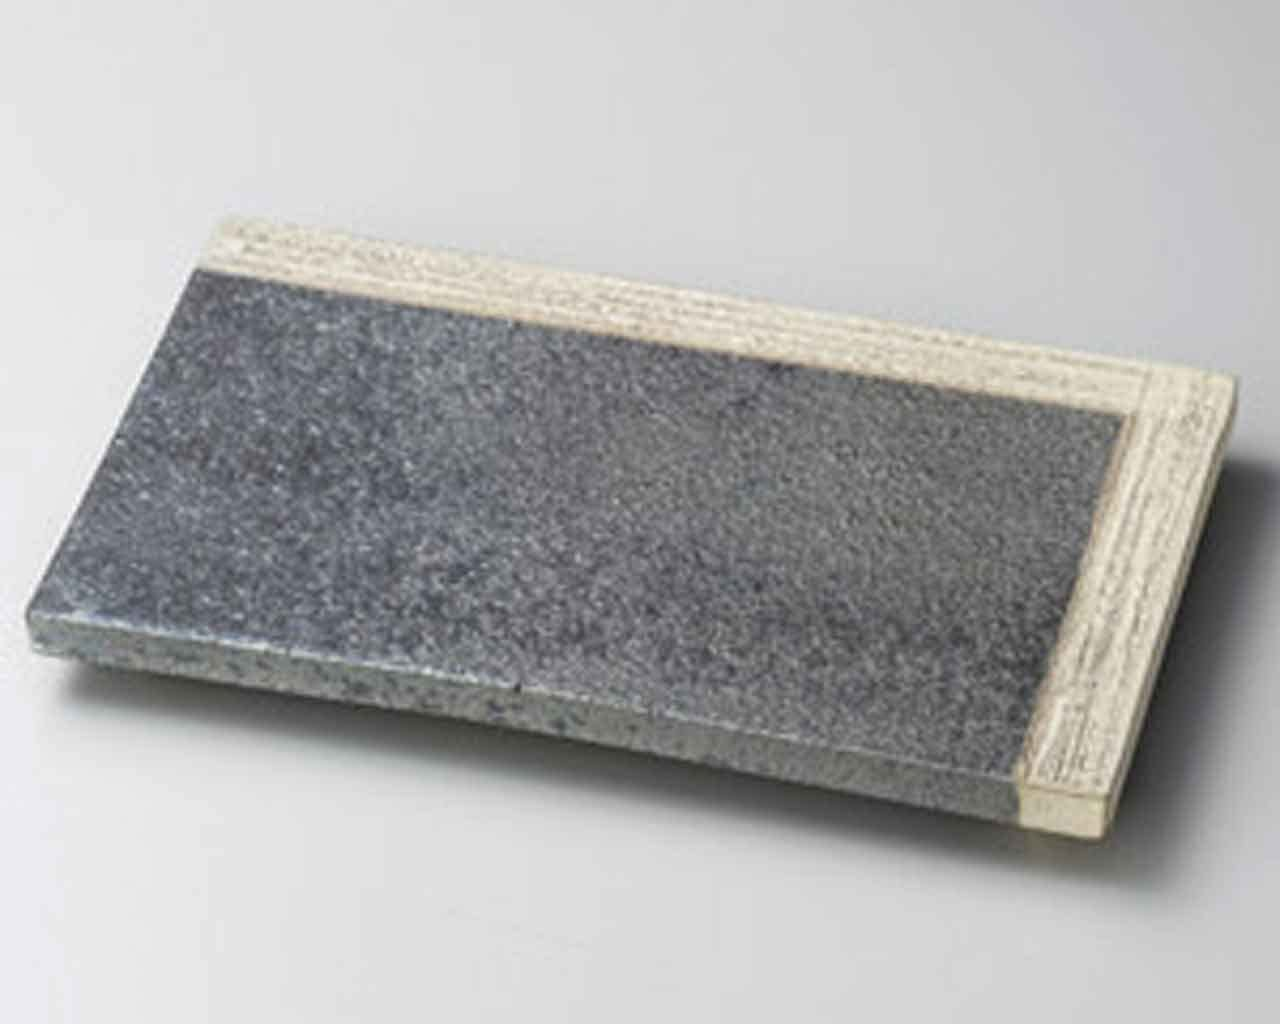 Yohen Kakewake 12.2inch Long Plate Grey Ceramic Made in Japan